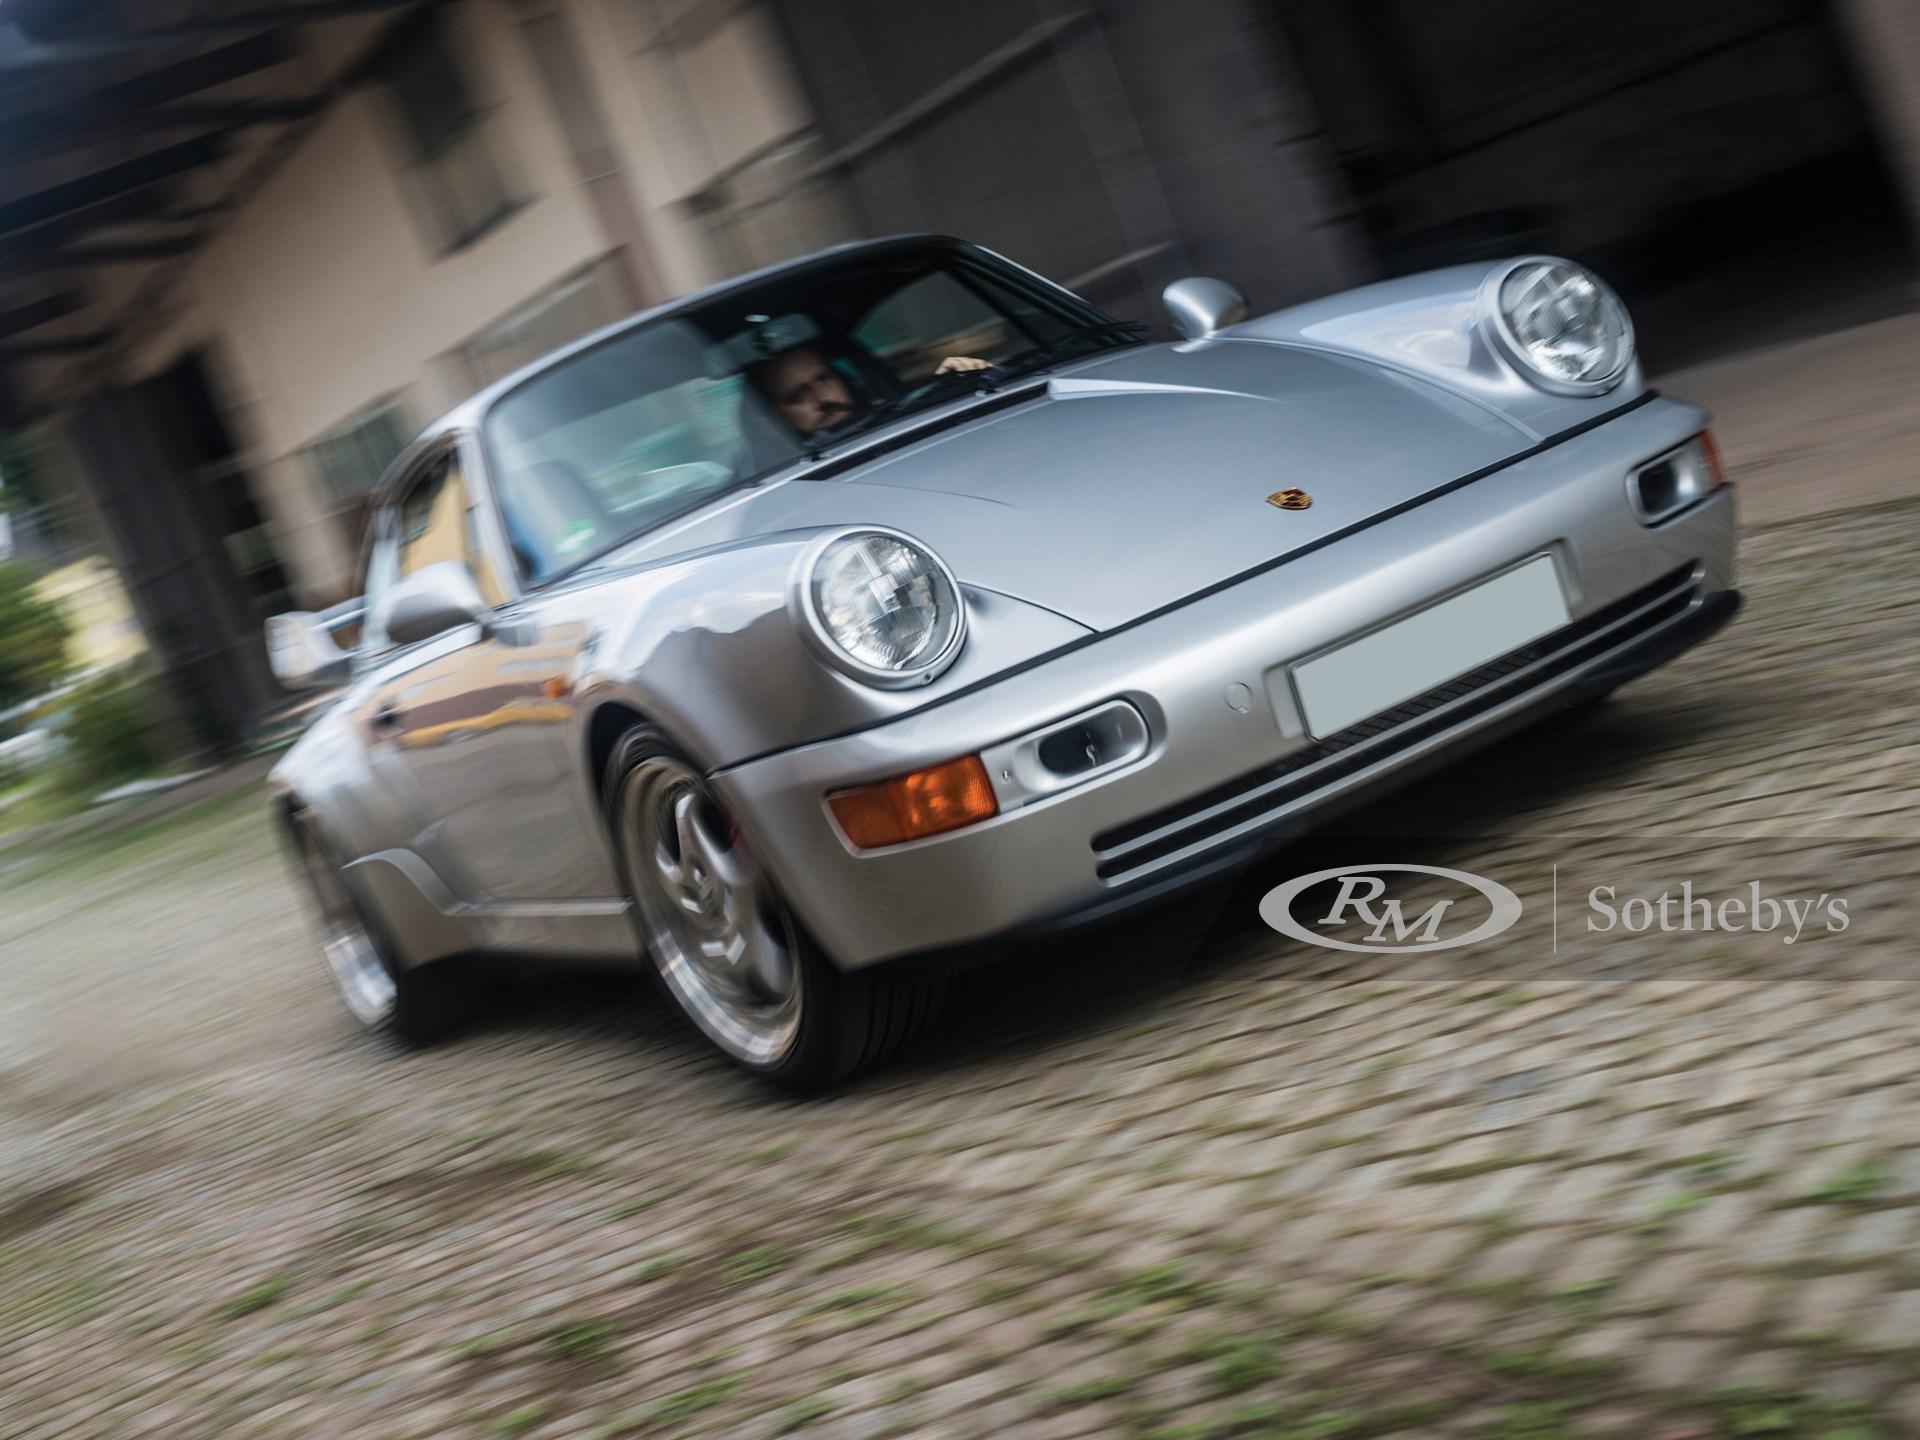 1993 Porsche 911 Carrera RS 3.8  -